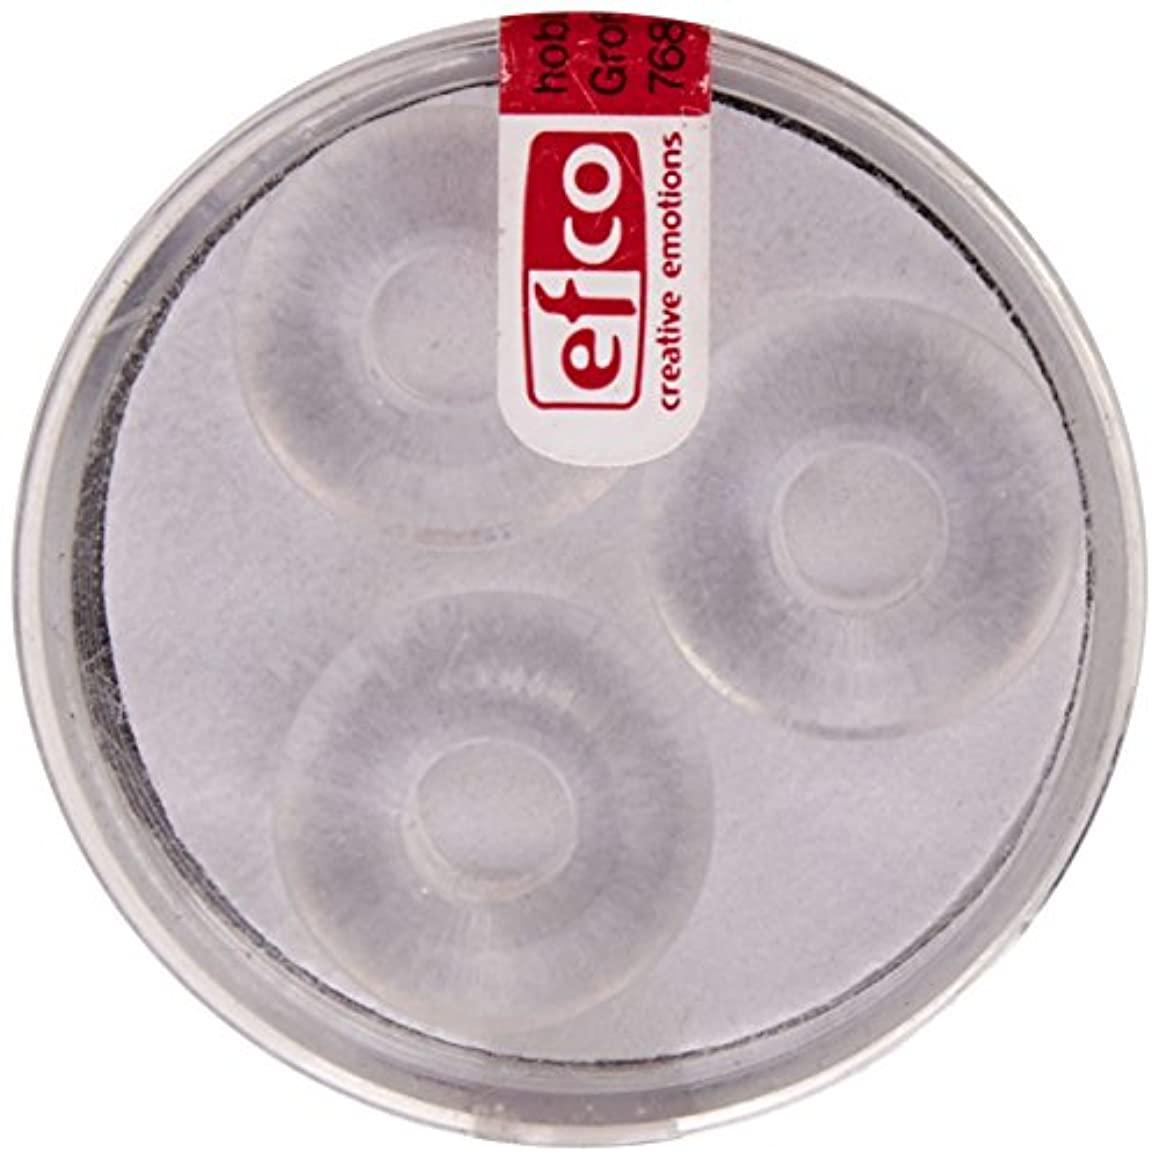 Efco Glass Bead Ring Big Hole 11 x 17 mm / 6 mm 3 pcs. Crystal, 3 x 3 x 2 cm